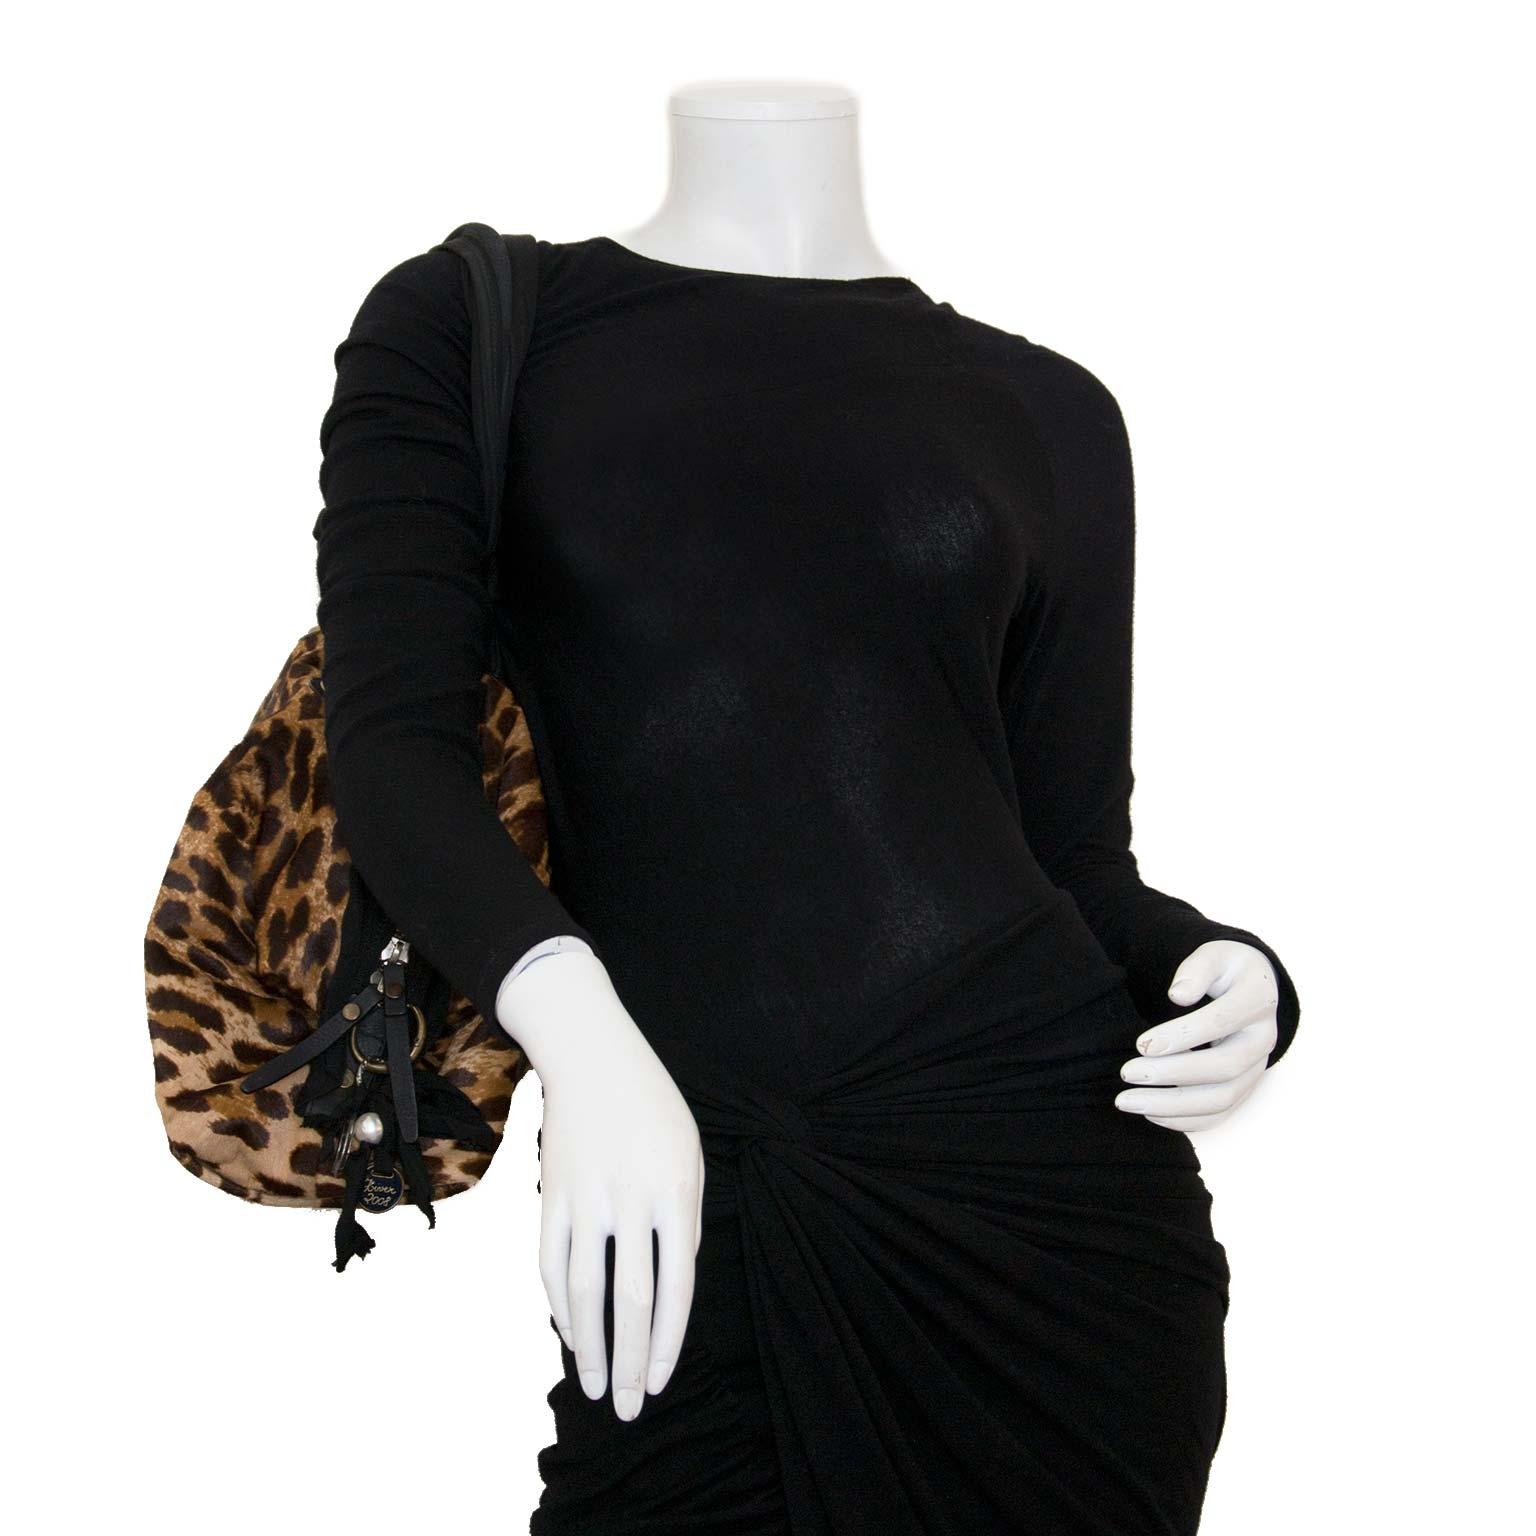 0e54853e99a ... Koop authentieke tweedehands Lanvin leopard tassen bij labellov vintage  mode webshop